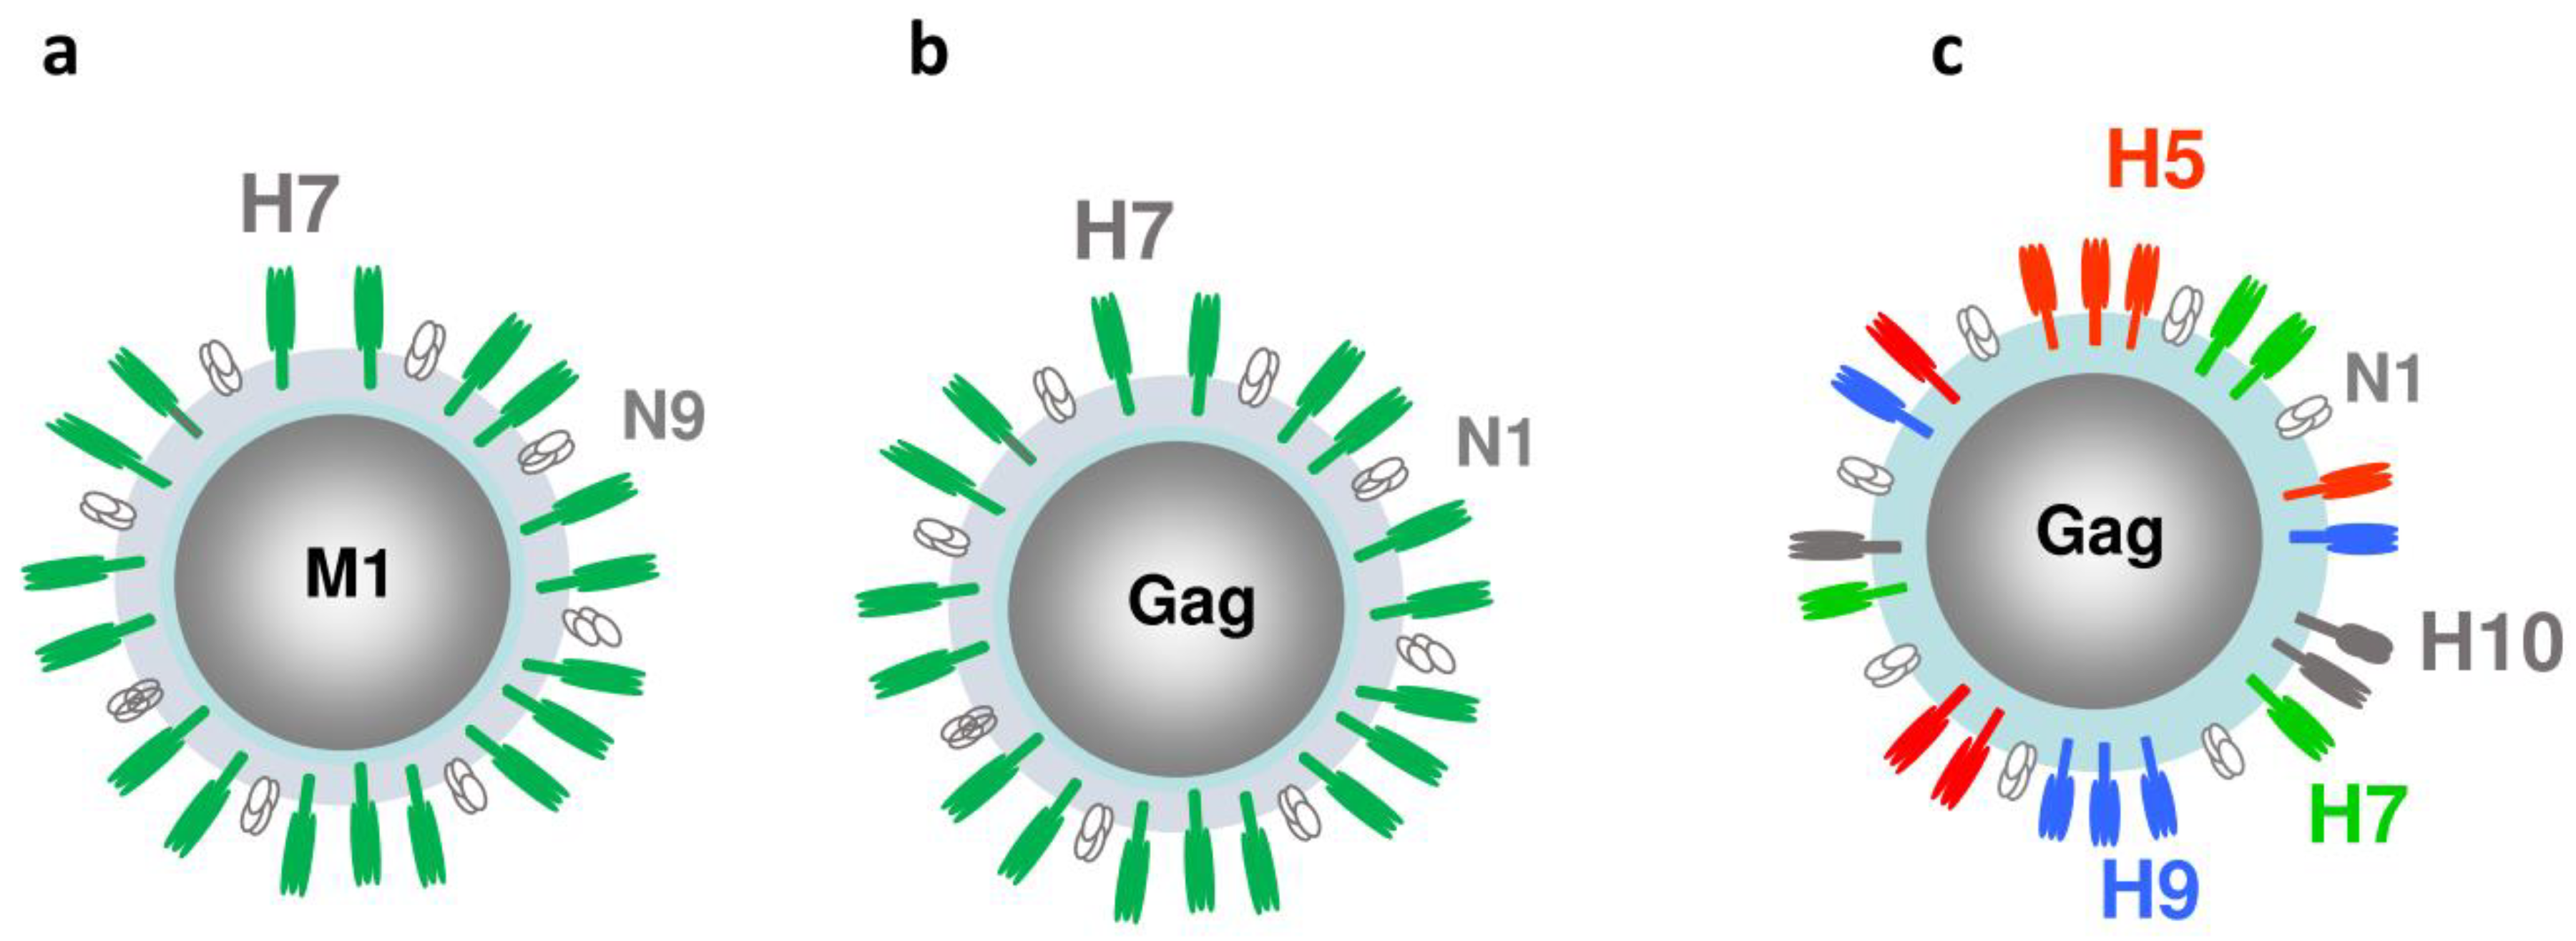 Viruses | Free Full-Text | Influenza Virus Like Particles (VLPs):  Opportunities for H7N9 Vaccine Development | HTML